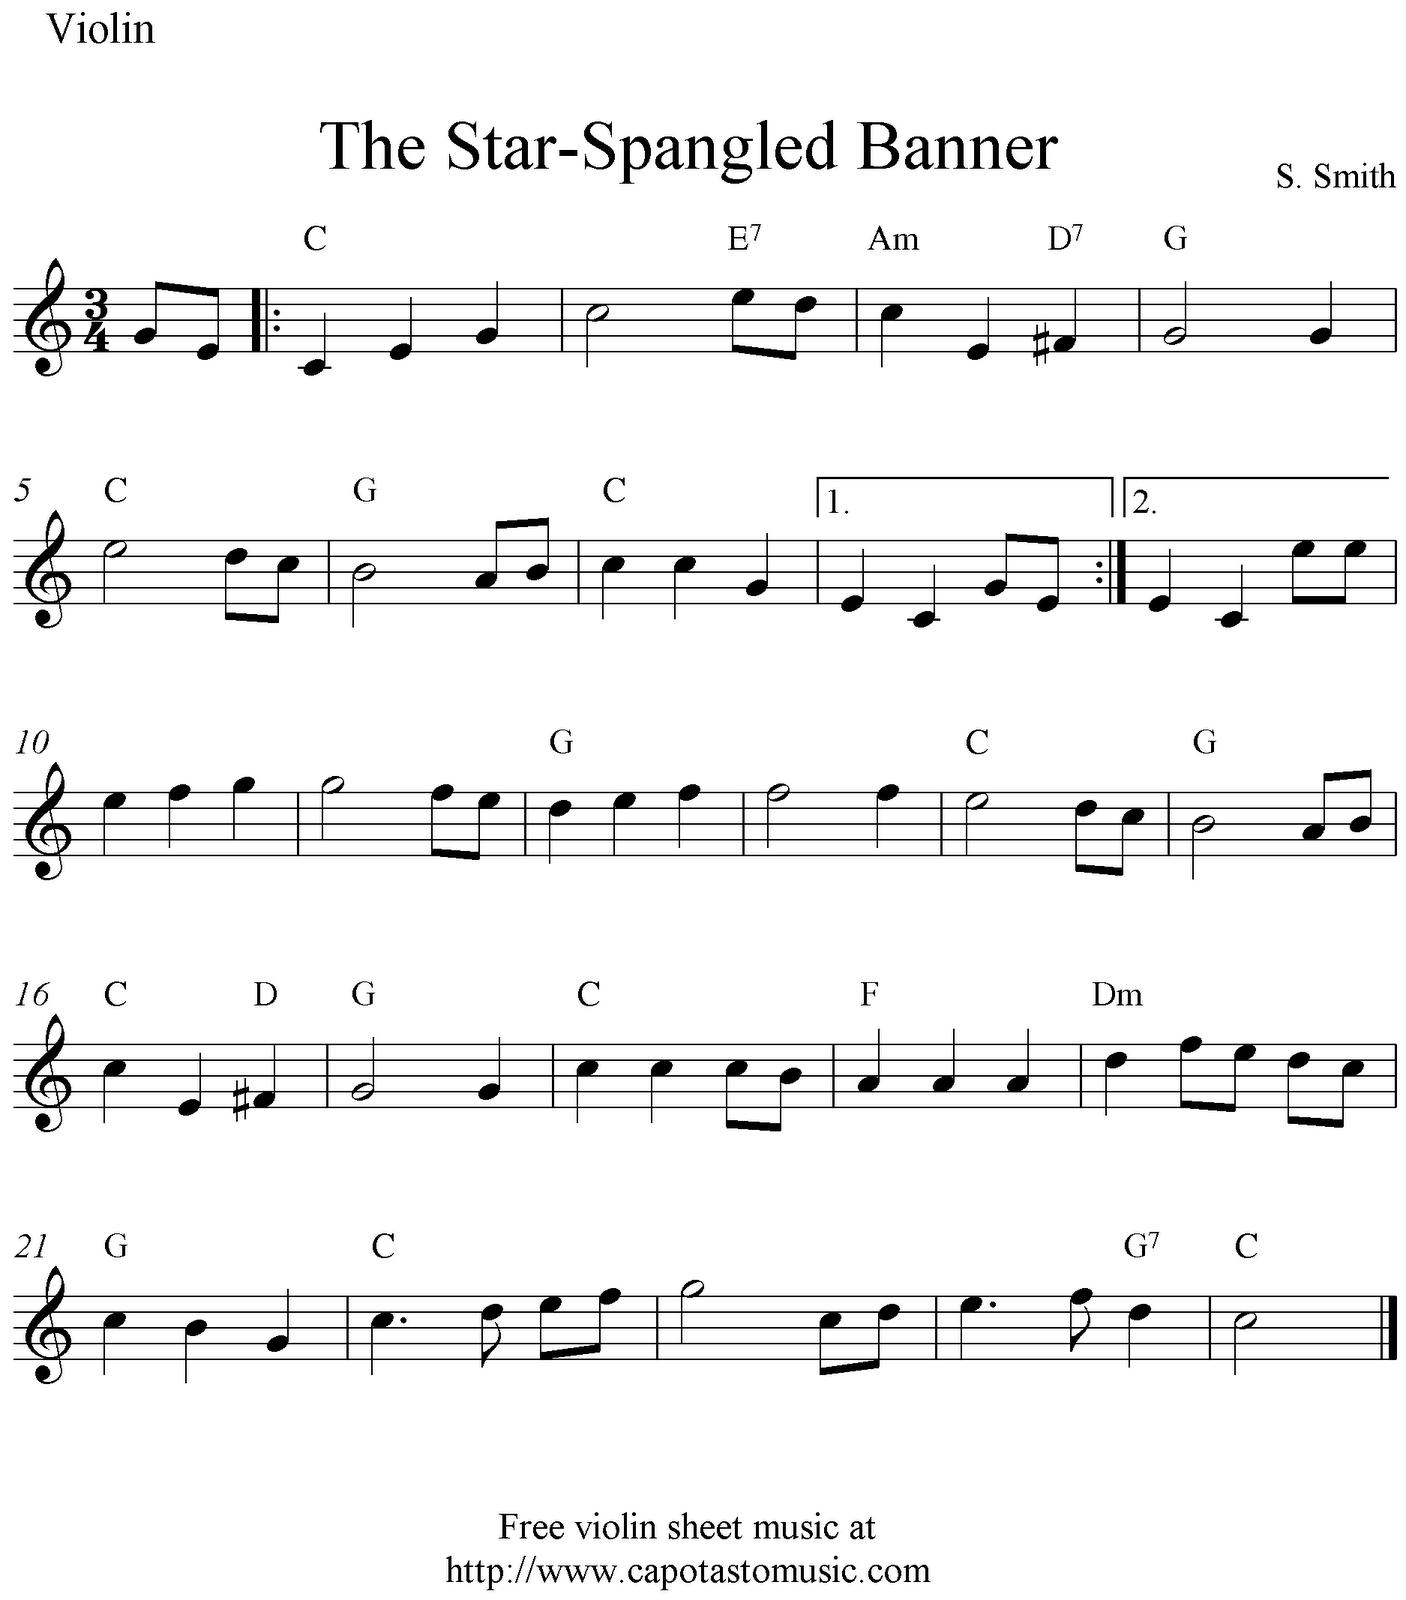 Sheet Music Violin | The Star-Spangled Banner, Free Easy Violin - Free Printable Piano Sheet Music For The Star Spangled Banner